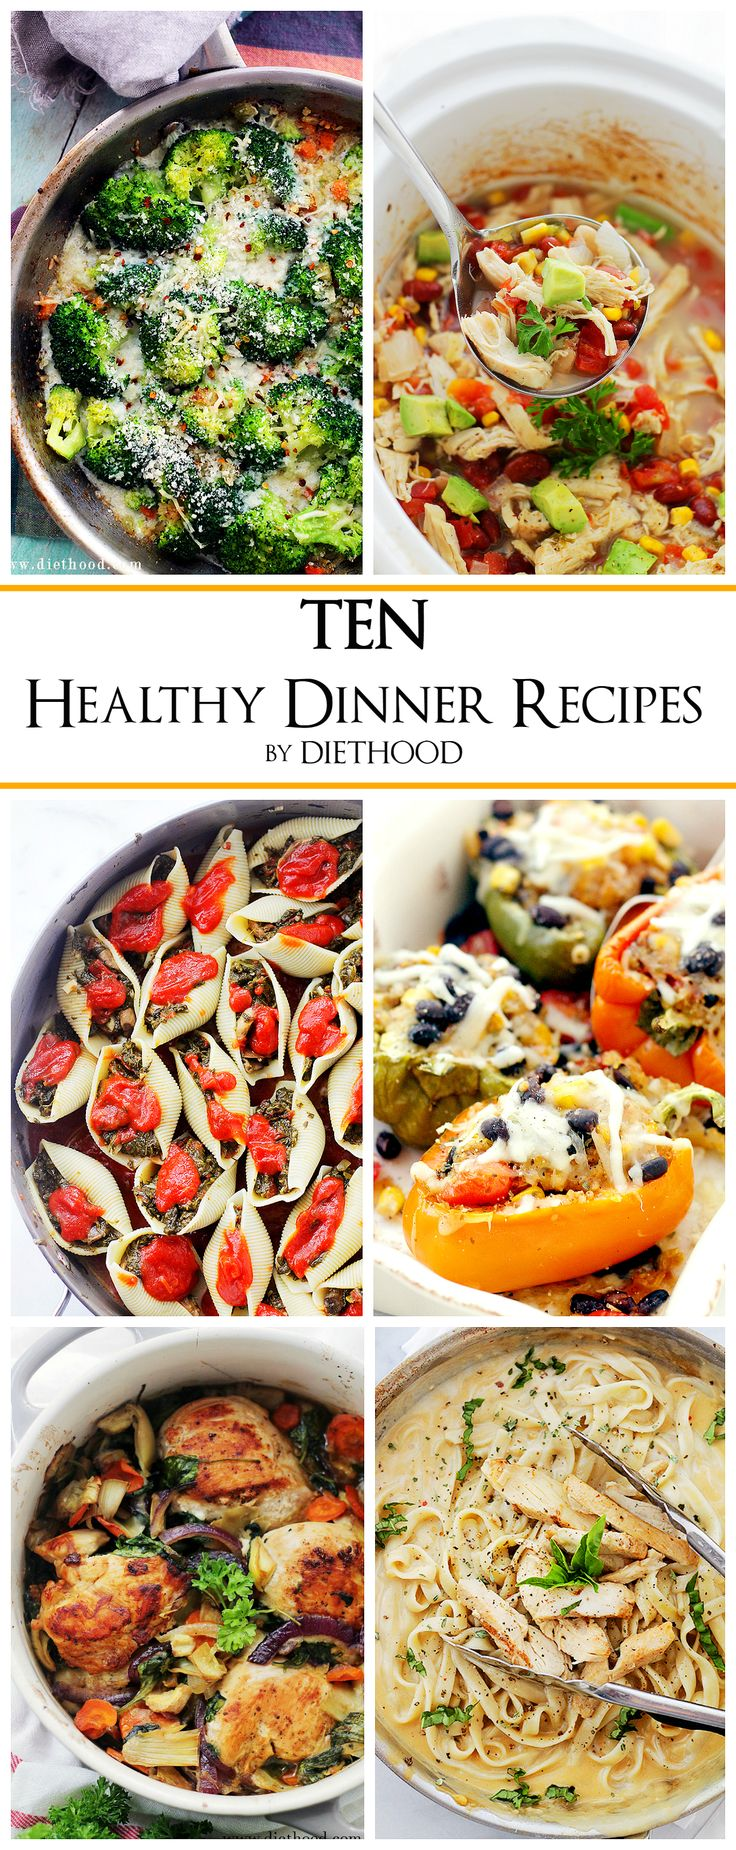 TEN Healthy Easy Dinner Recipes | www.diethood.com